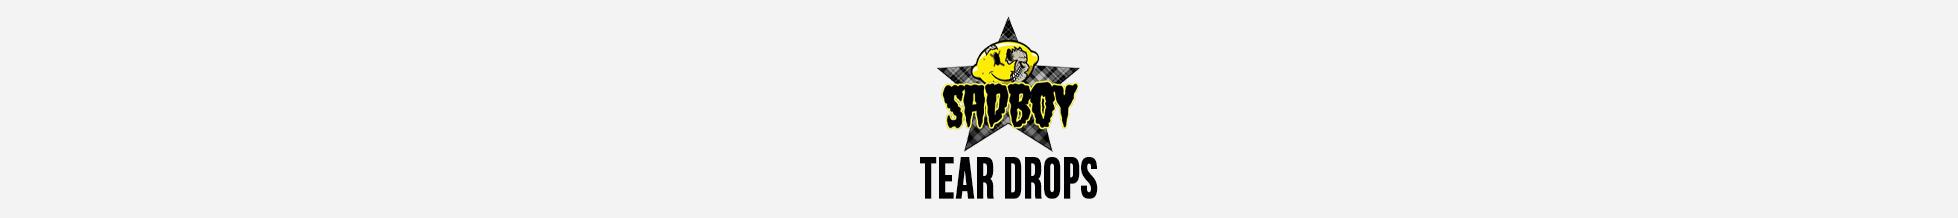 sadboy-tear-drops.jpg